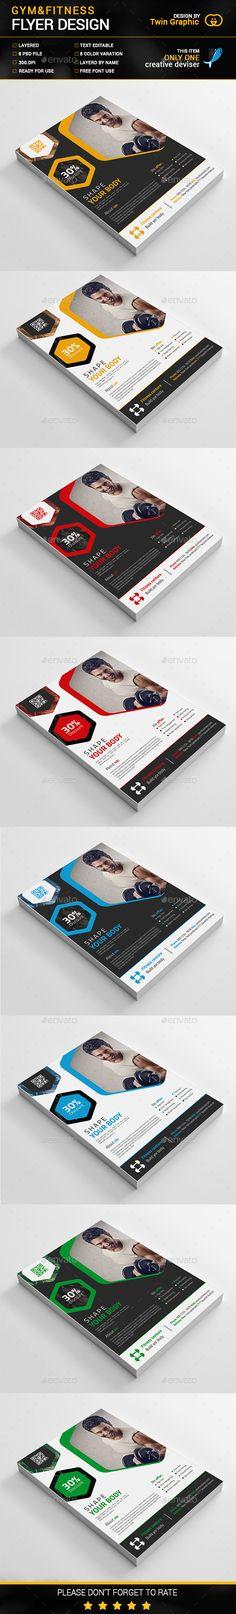 Gym&Fitness Flyer Design Template PSD. Download here: http://graphicriver.net/item/gymfitness-flyer-design/15432995?ref=ksioks